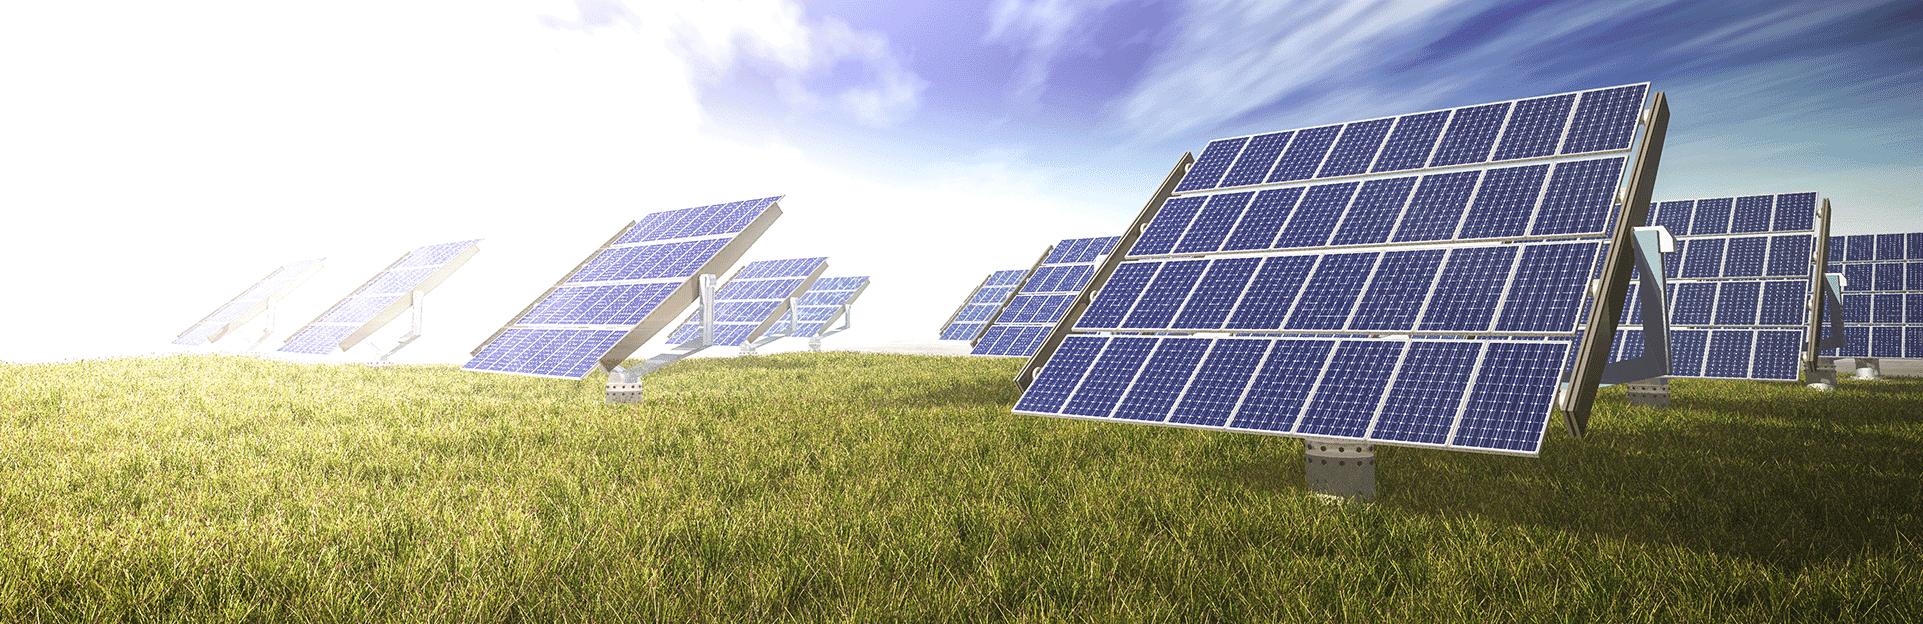 LTTR-SEO-For-Energy-Companies